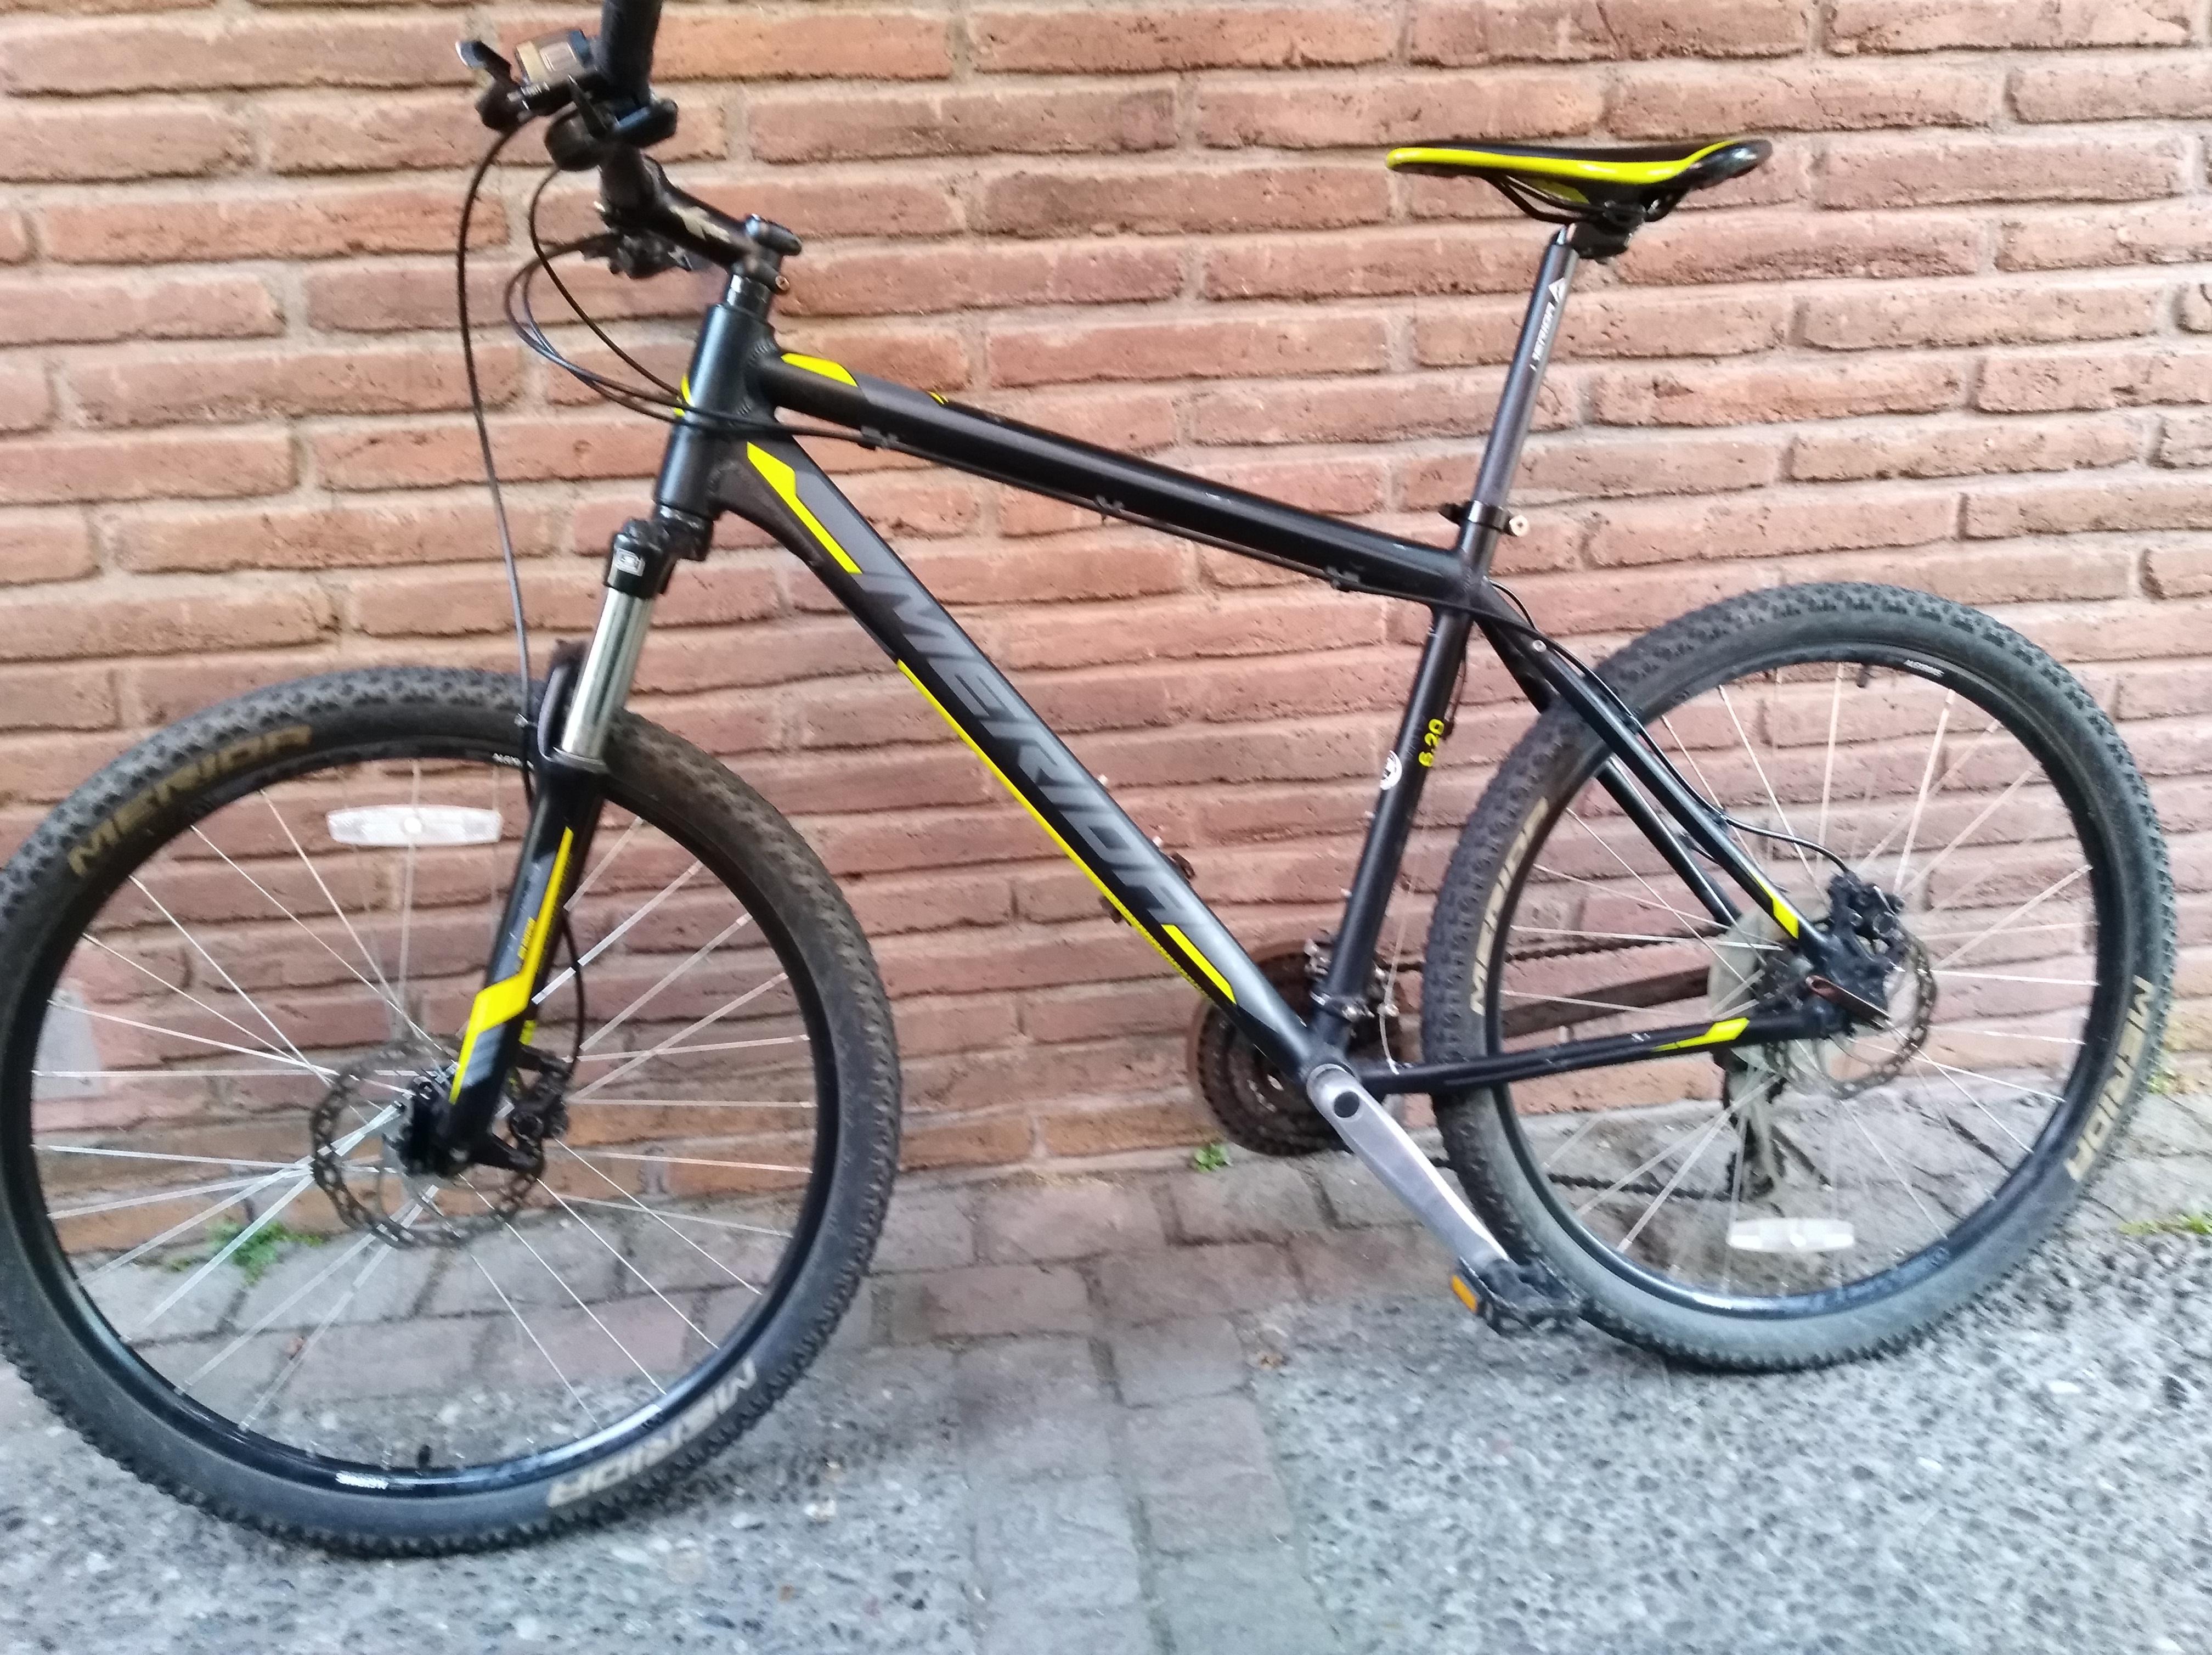 72b10047 Bicicleta Mtb Merida MATTS 6. 20-D Año 2015 26